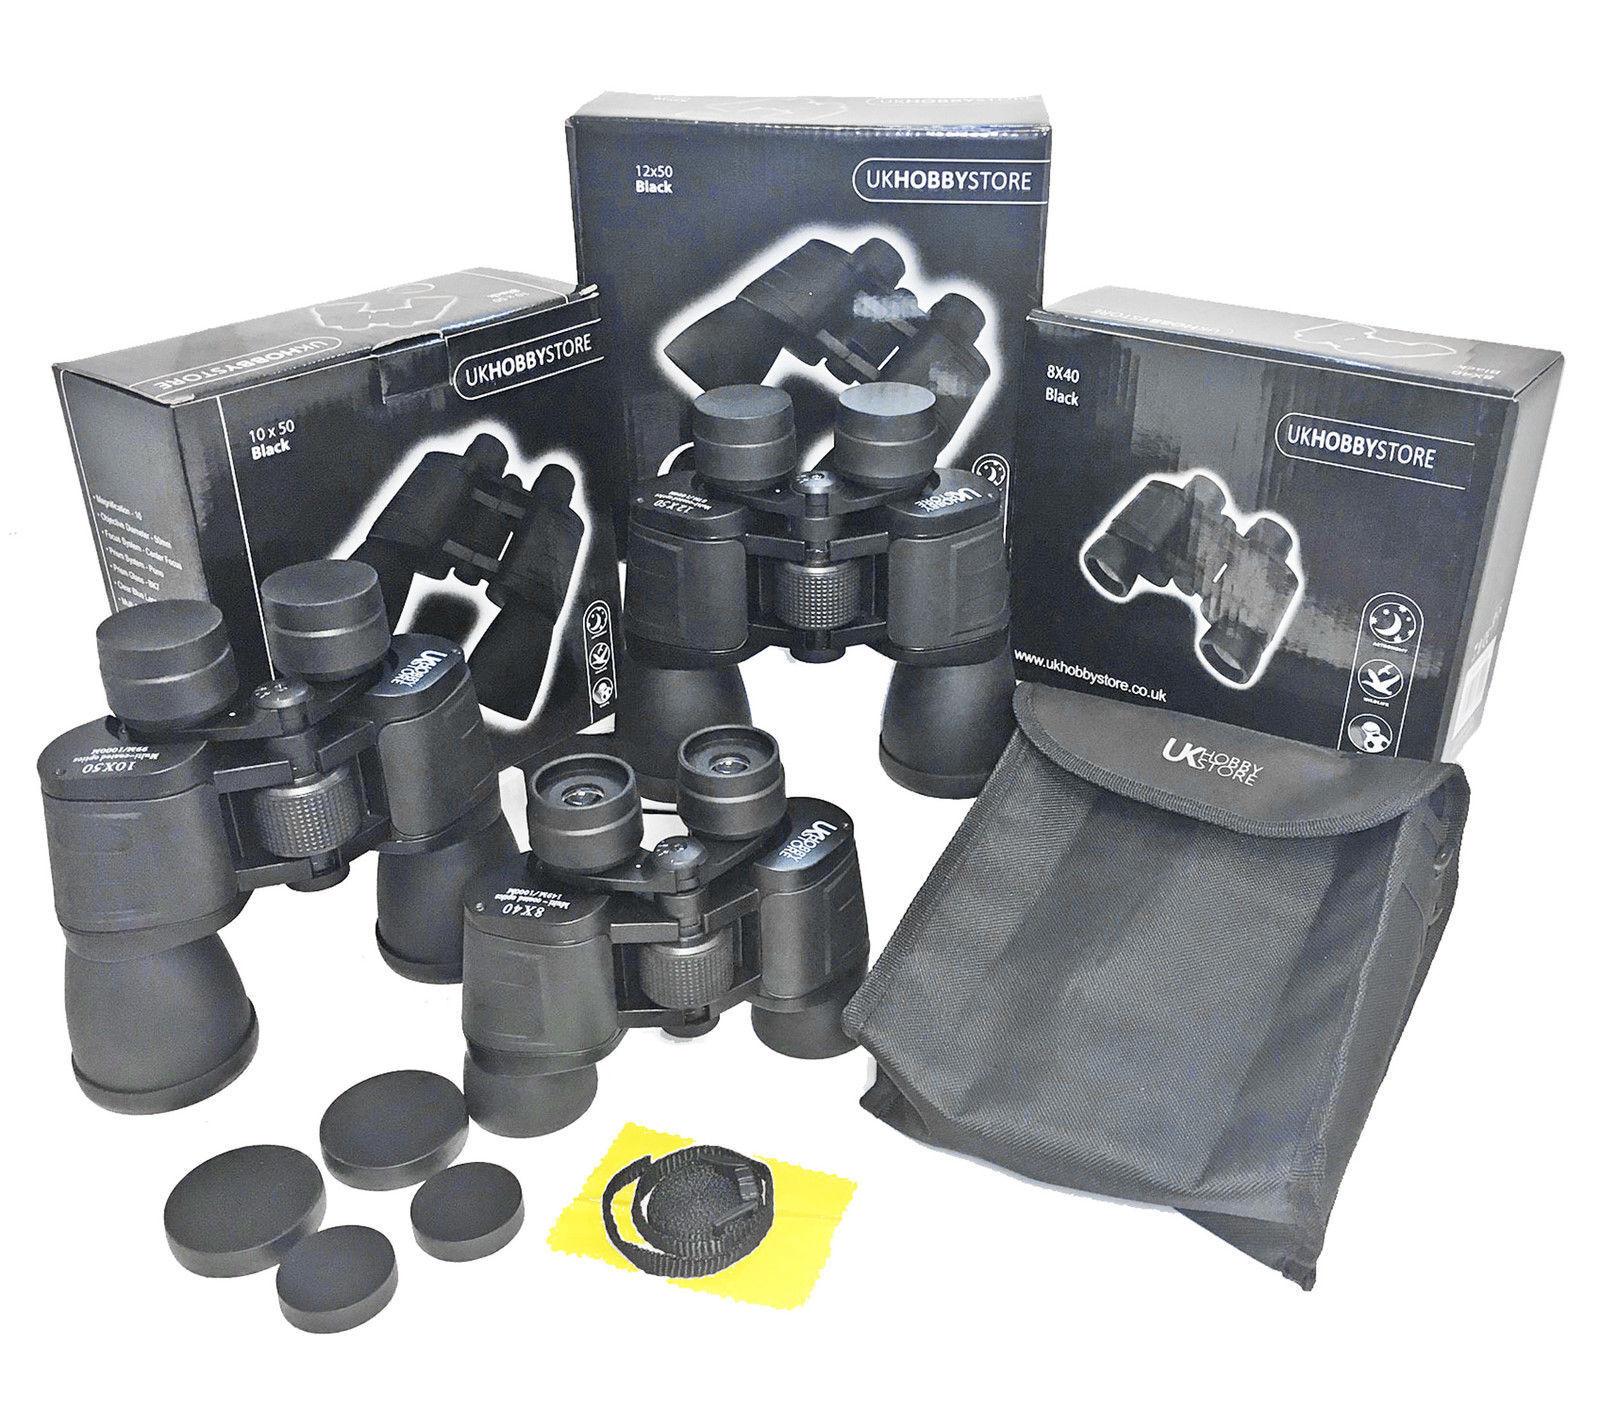 Bargain High Quality Porro Prism Binoculars 8x40 10x50 or 12x50 Fast Free UK P&P